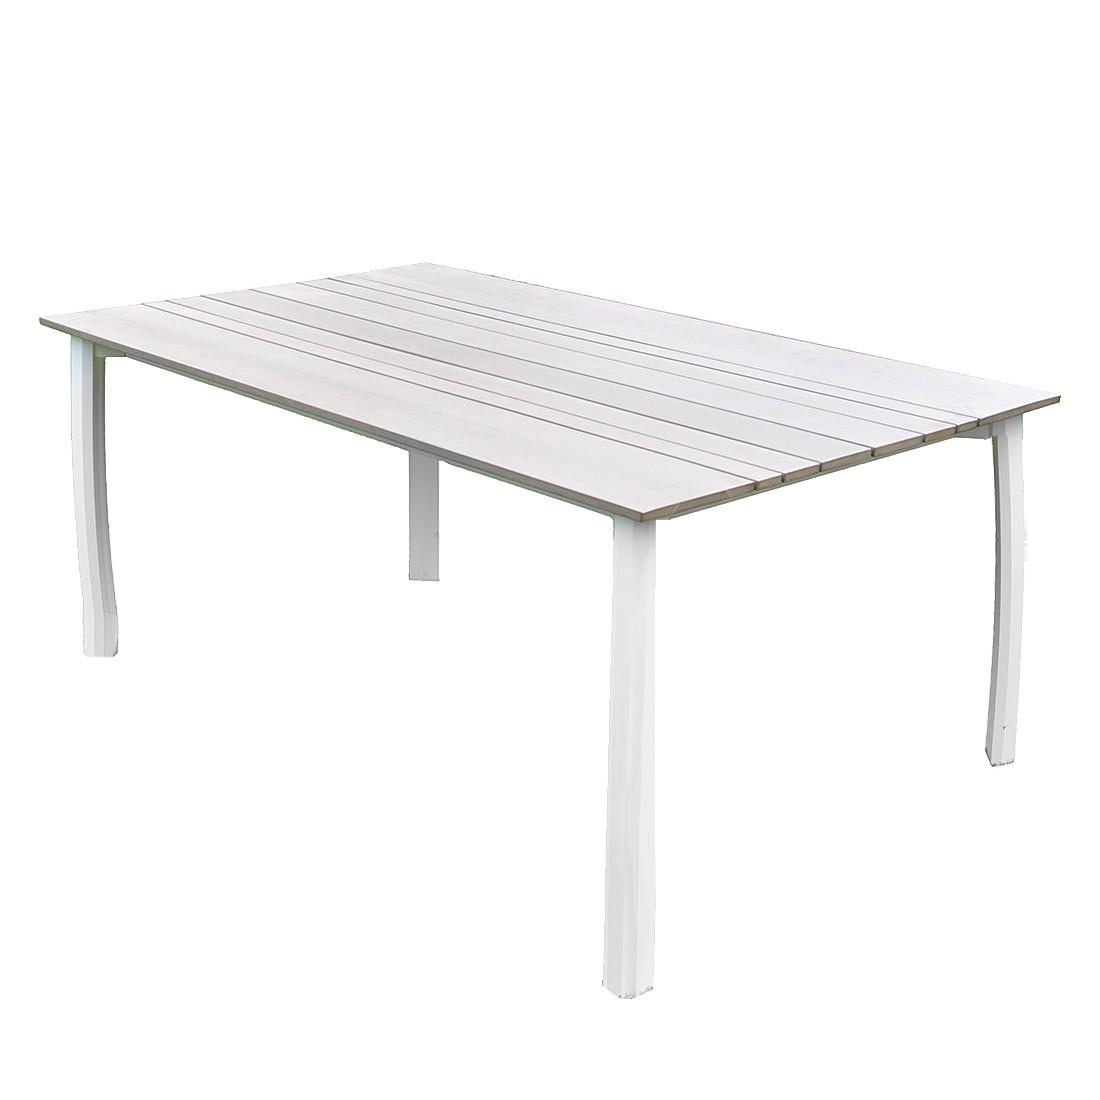 gartentisch escape aluminium kunststoff wei grau. Black Bedroom Furniture Sets. Home Design Ideas